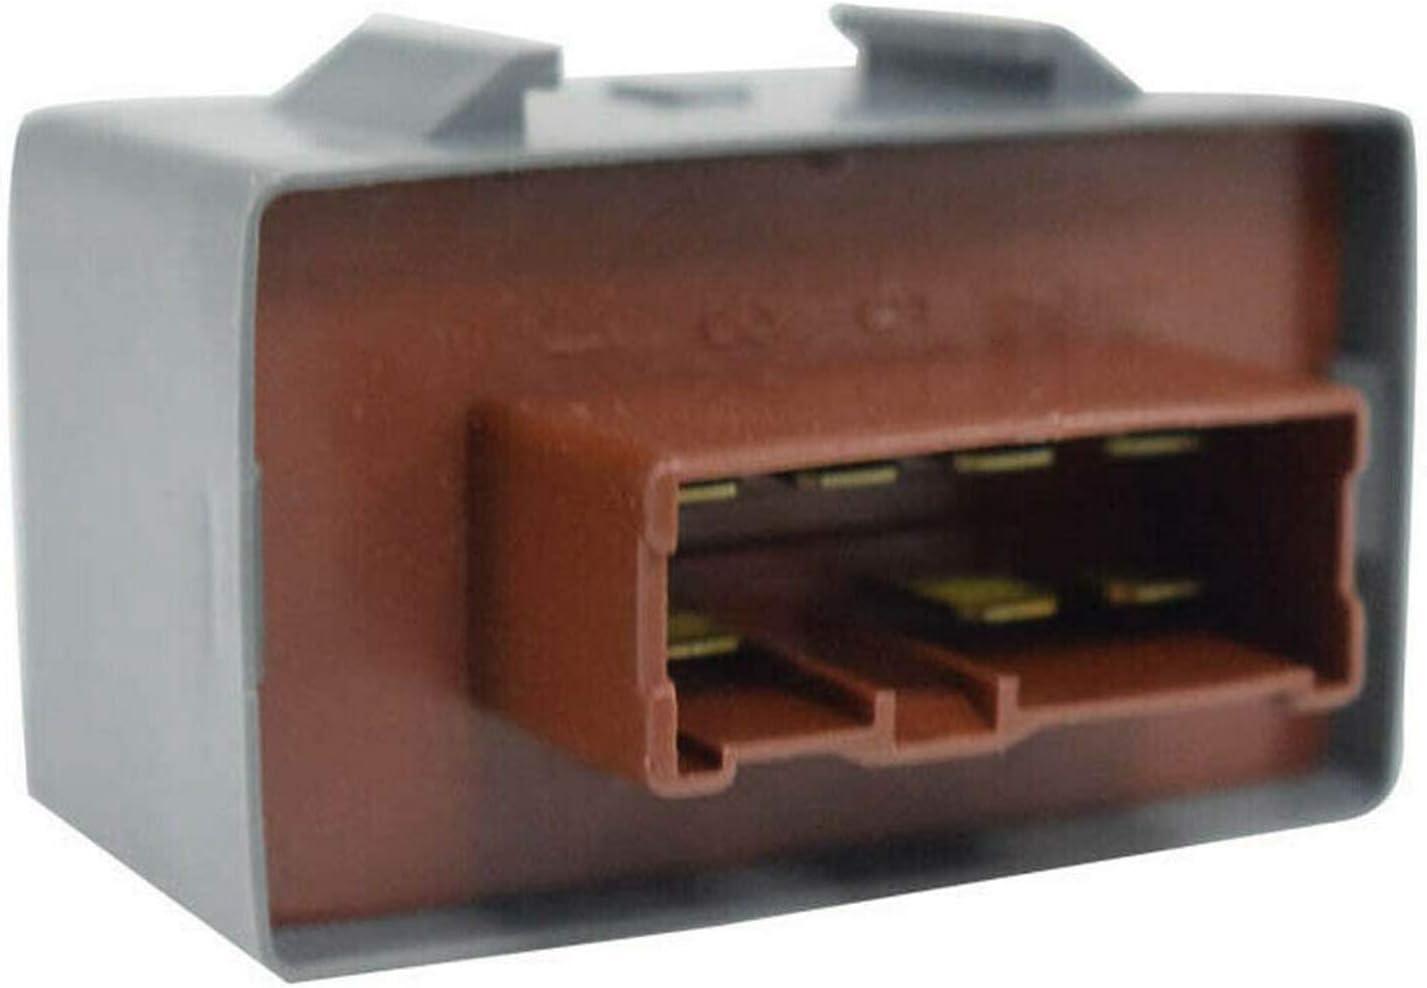 Dasing Pompe /à Essence Relais Principal 39400-SM4-A00 pour CL Integra TL Accord Del Sol CR-V 3 1998-2002